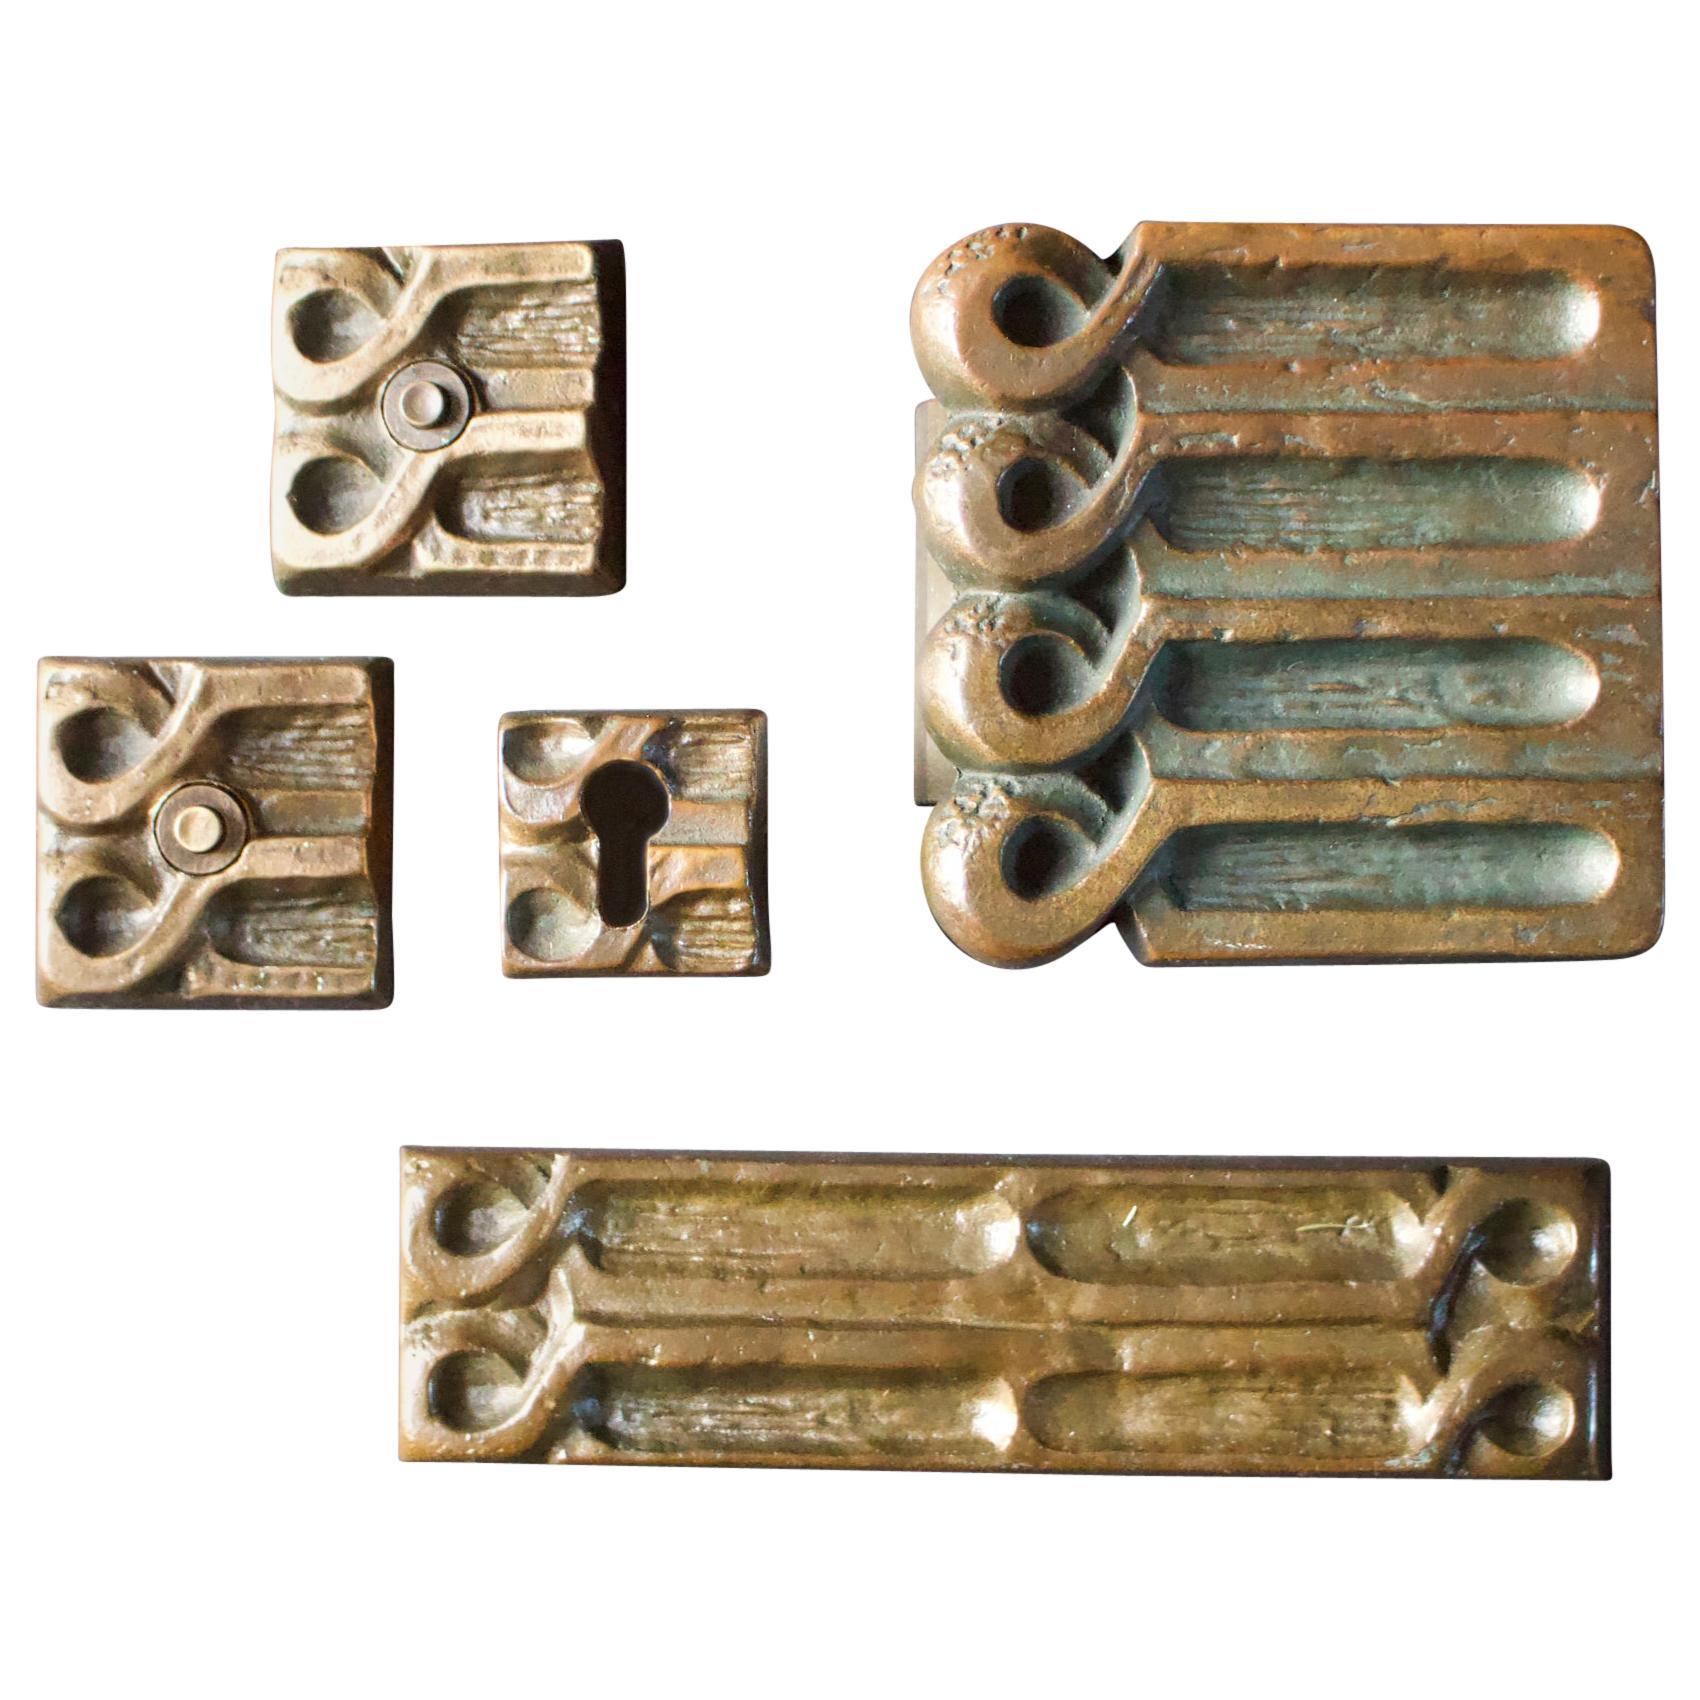 Brutalist Bronze Push or Pull Door Handle Set with Abstract Design, 20th Century